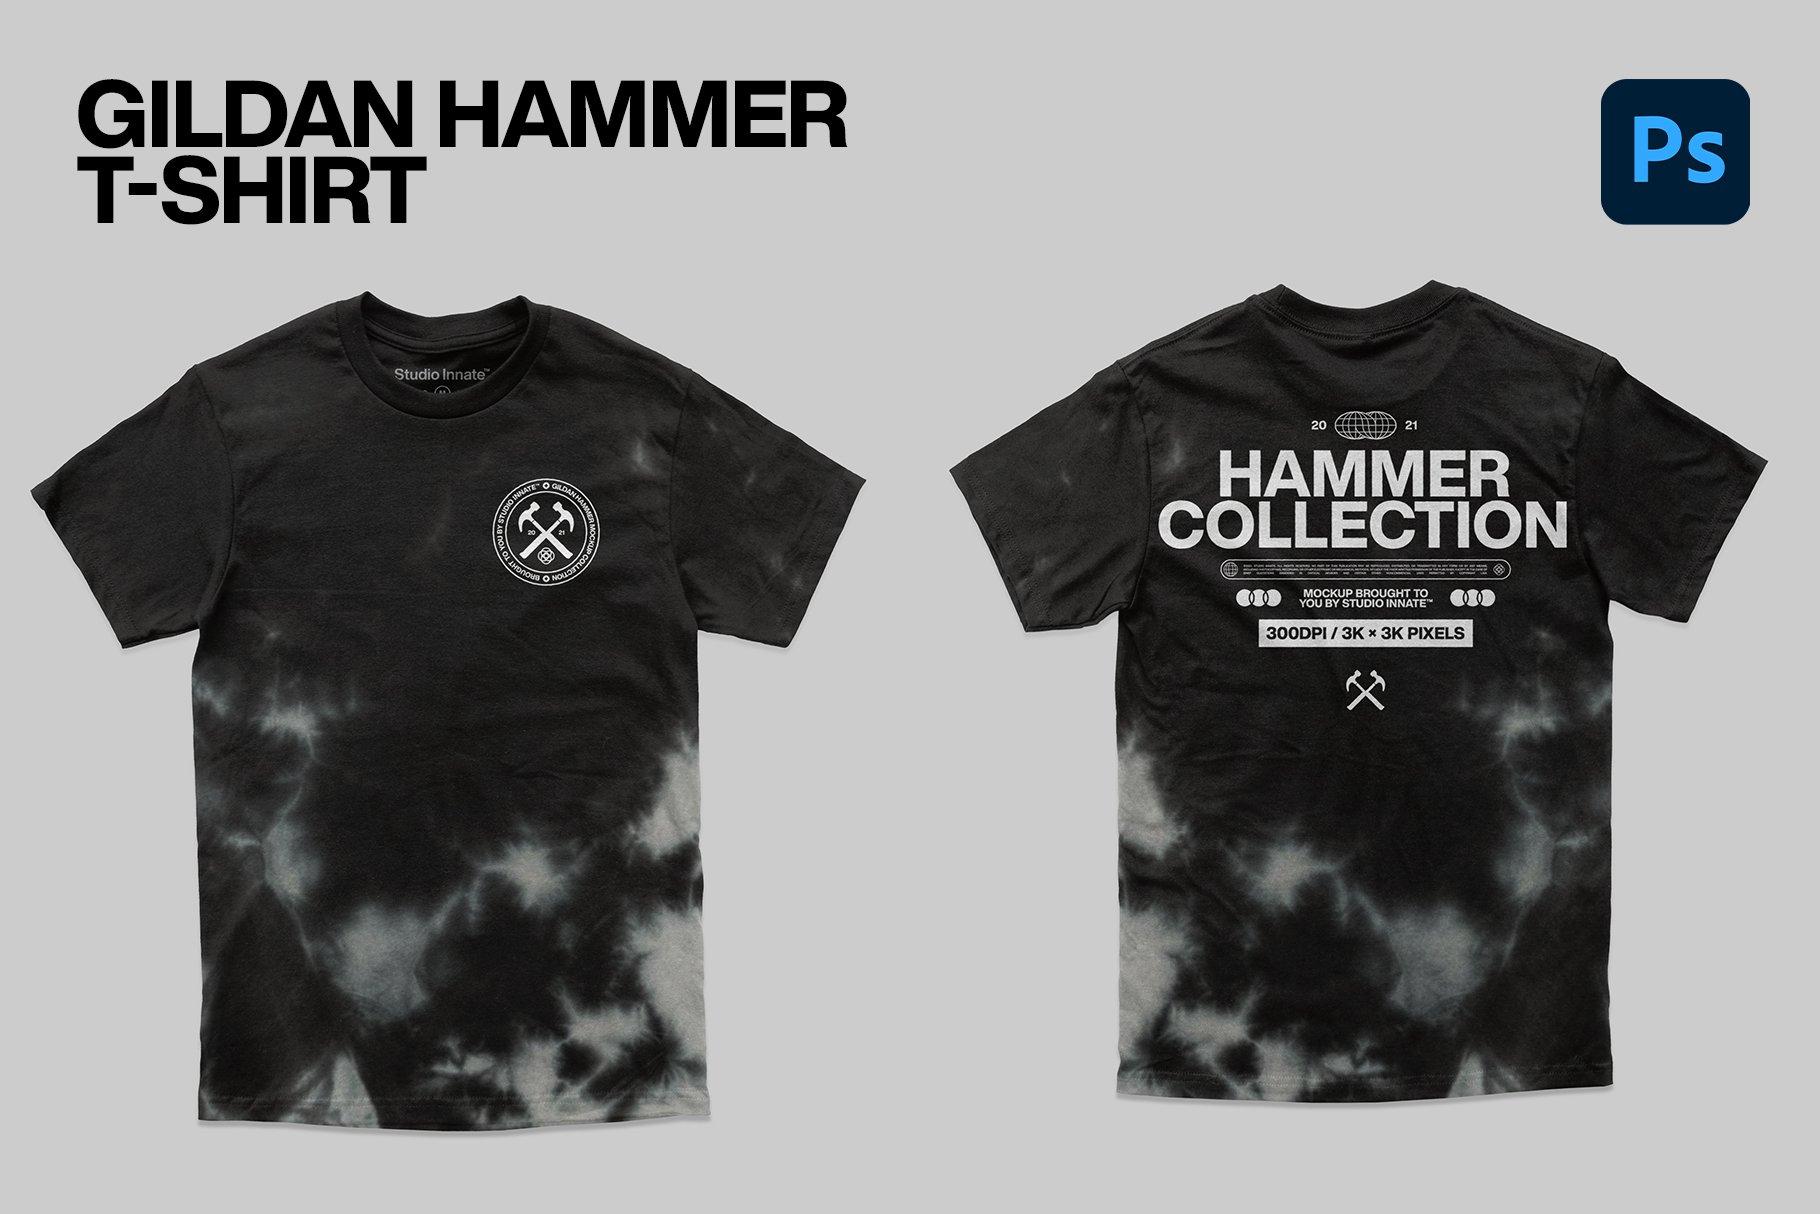 Hammer Collection 卫衣短袖PSD服装样机(4323)插图(1)